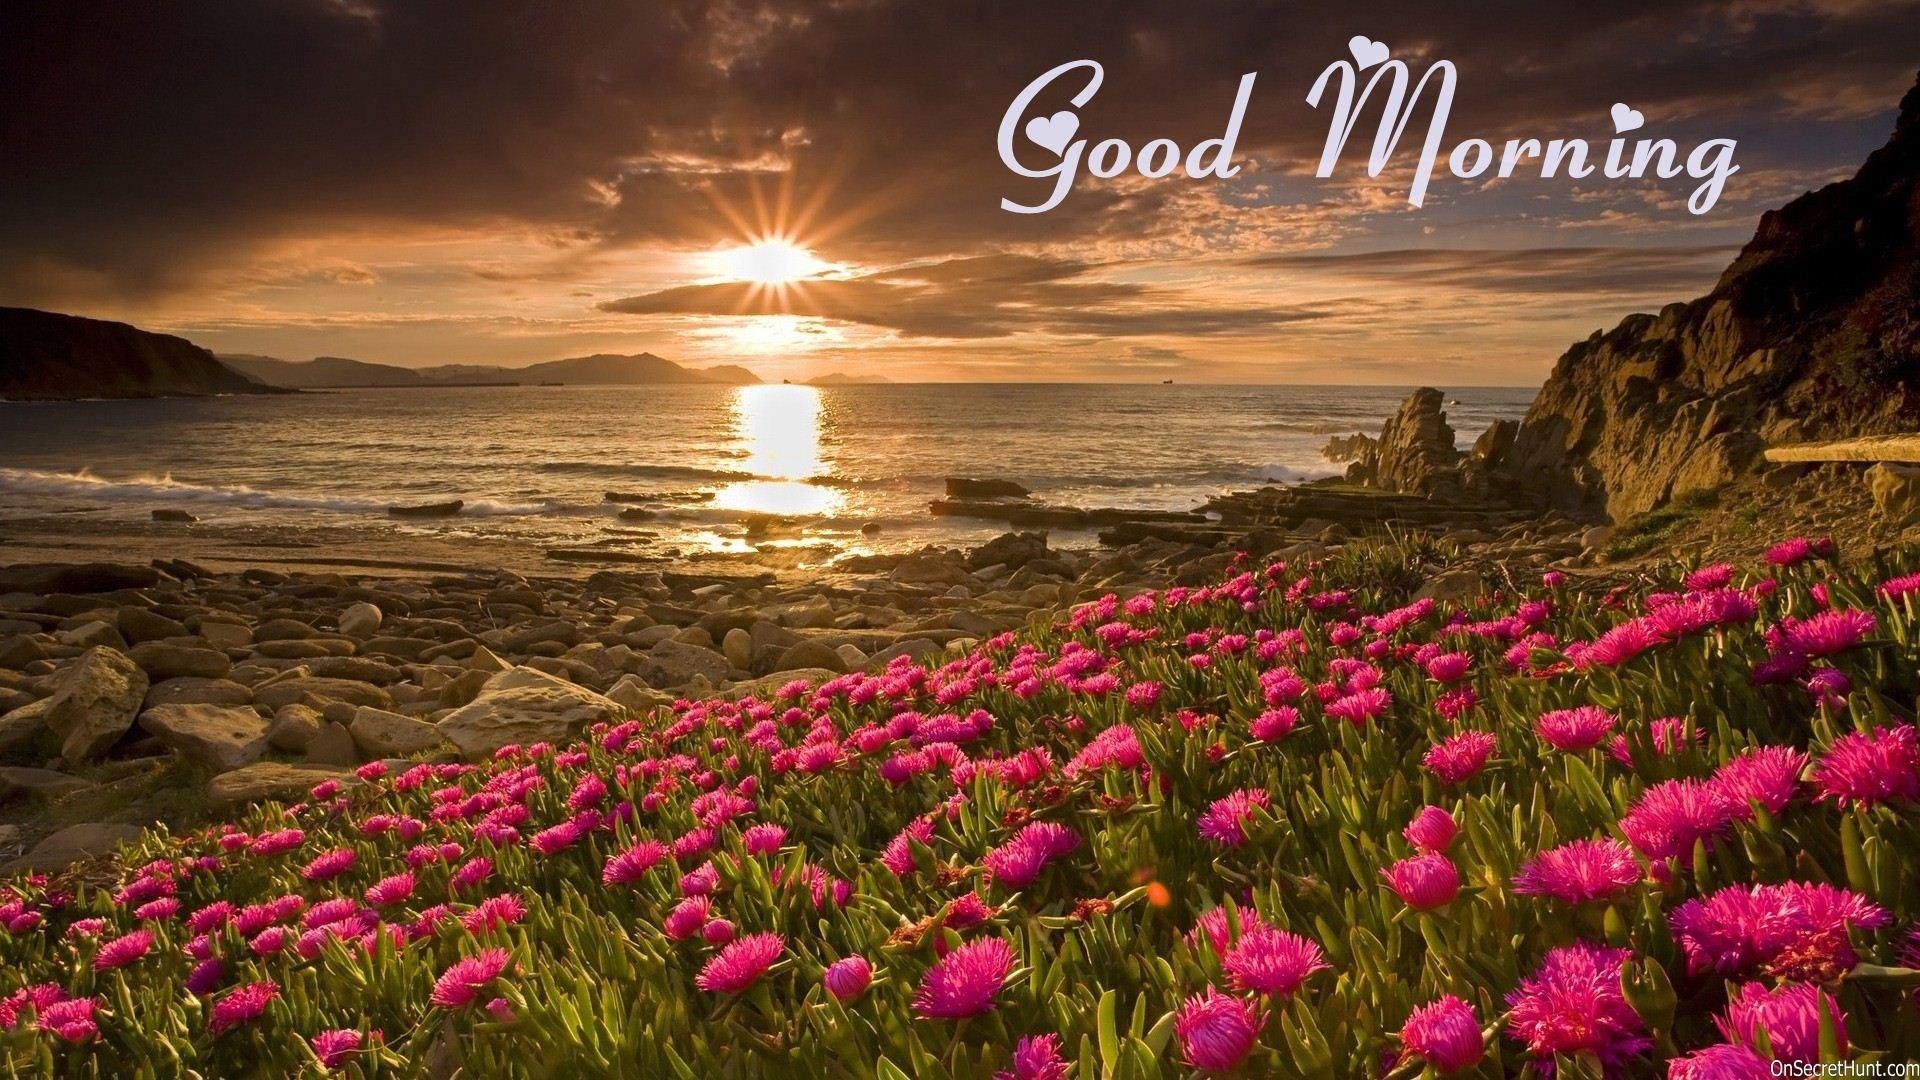 Good Morning Wallpaper 1920×1080 hd background hd screensavers hd wallpaper  1920p 1080p wallpaper full